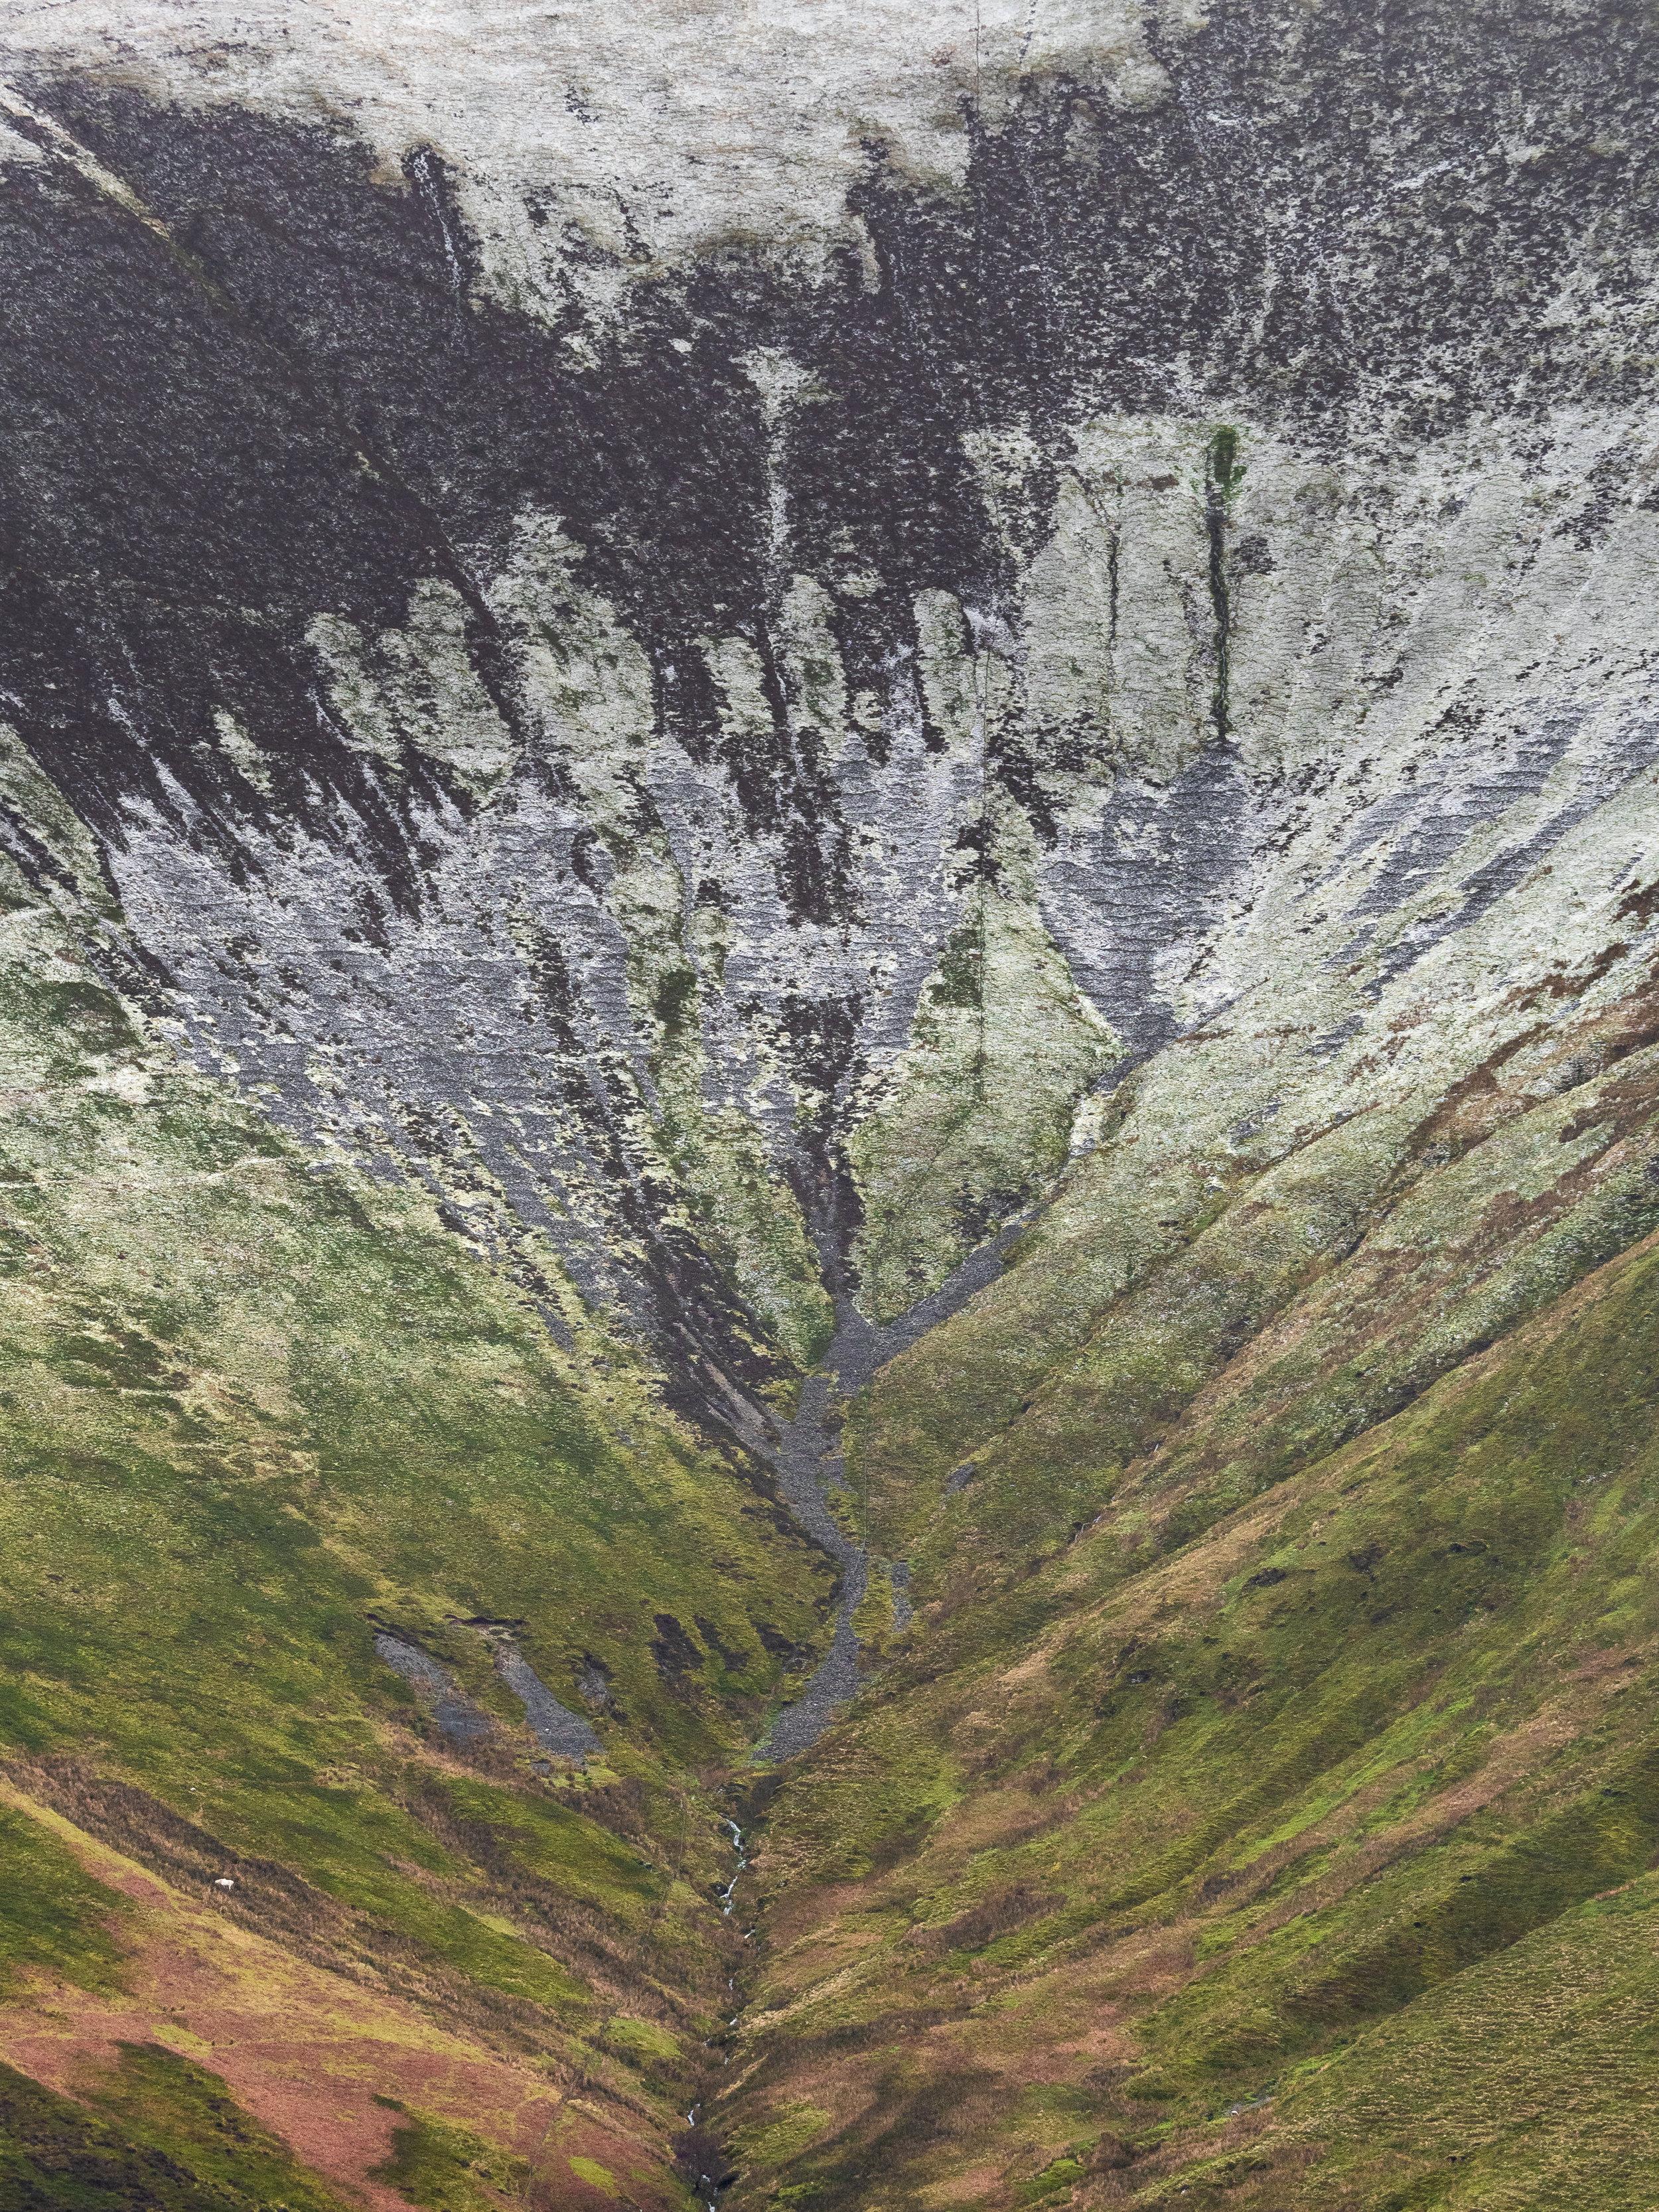 Cadair Idris Winter Trip 2019